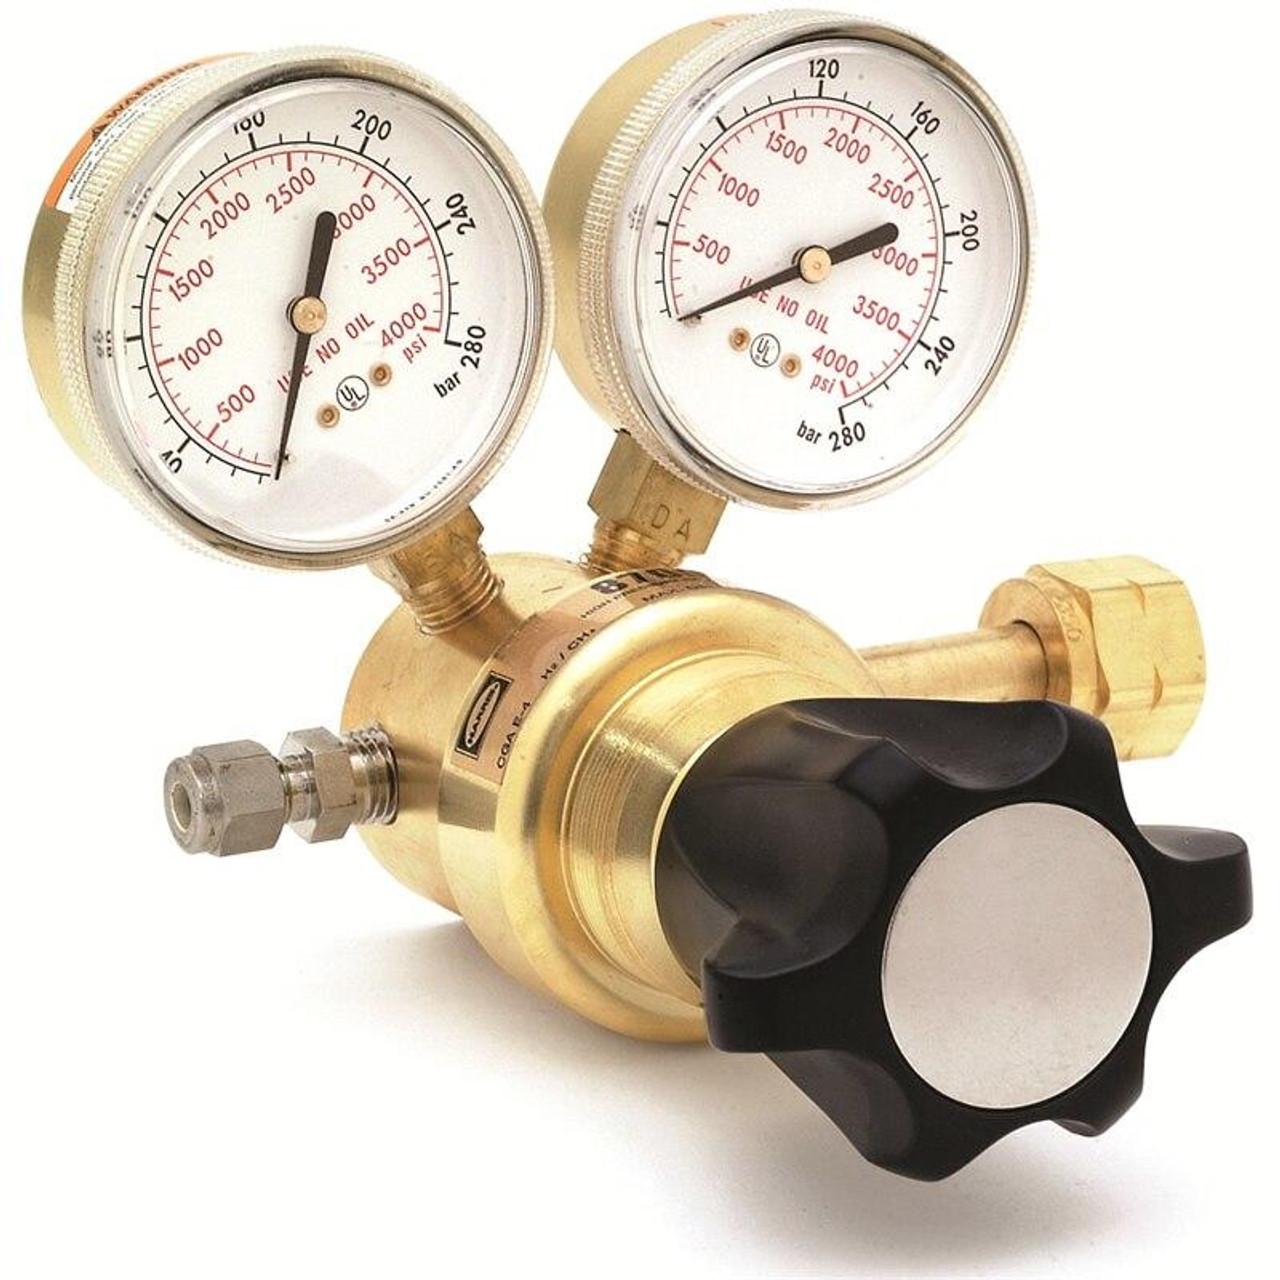 Harris Model 8700-3000-680 Argon, Helium, Nitrogen Ultra High Delivery Pressure Regulator - 3200326